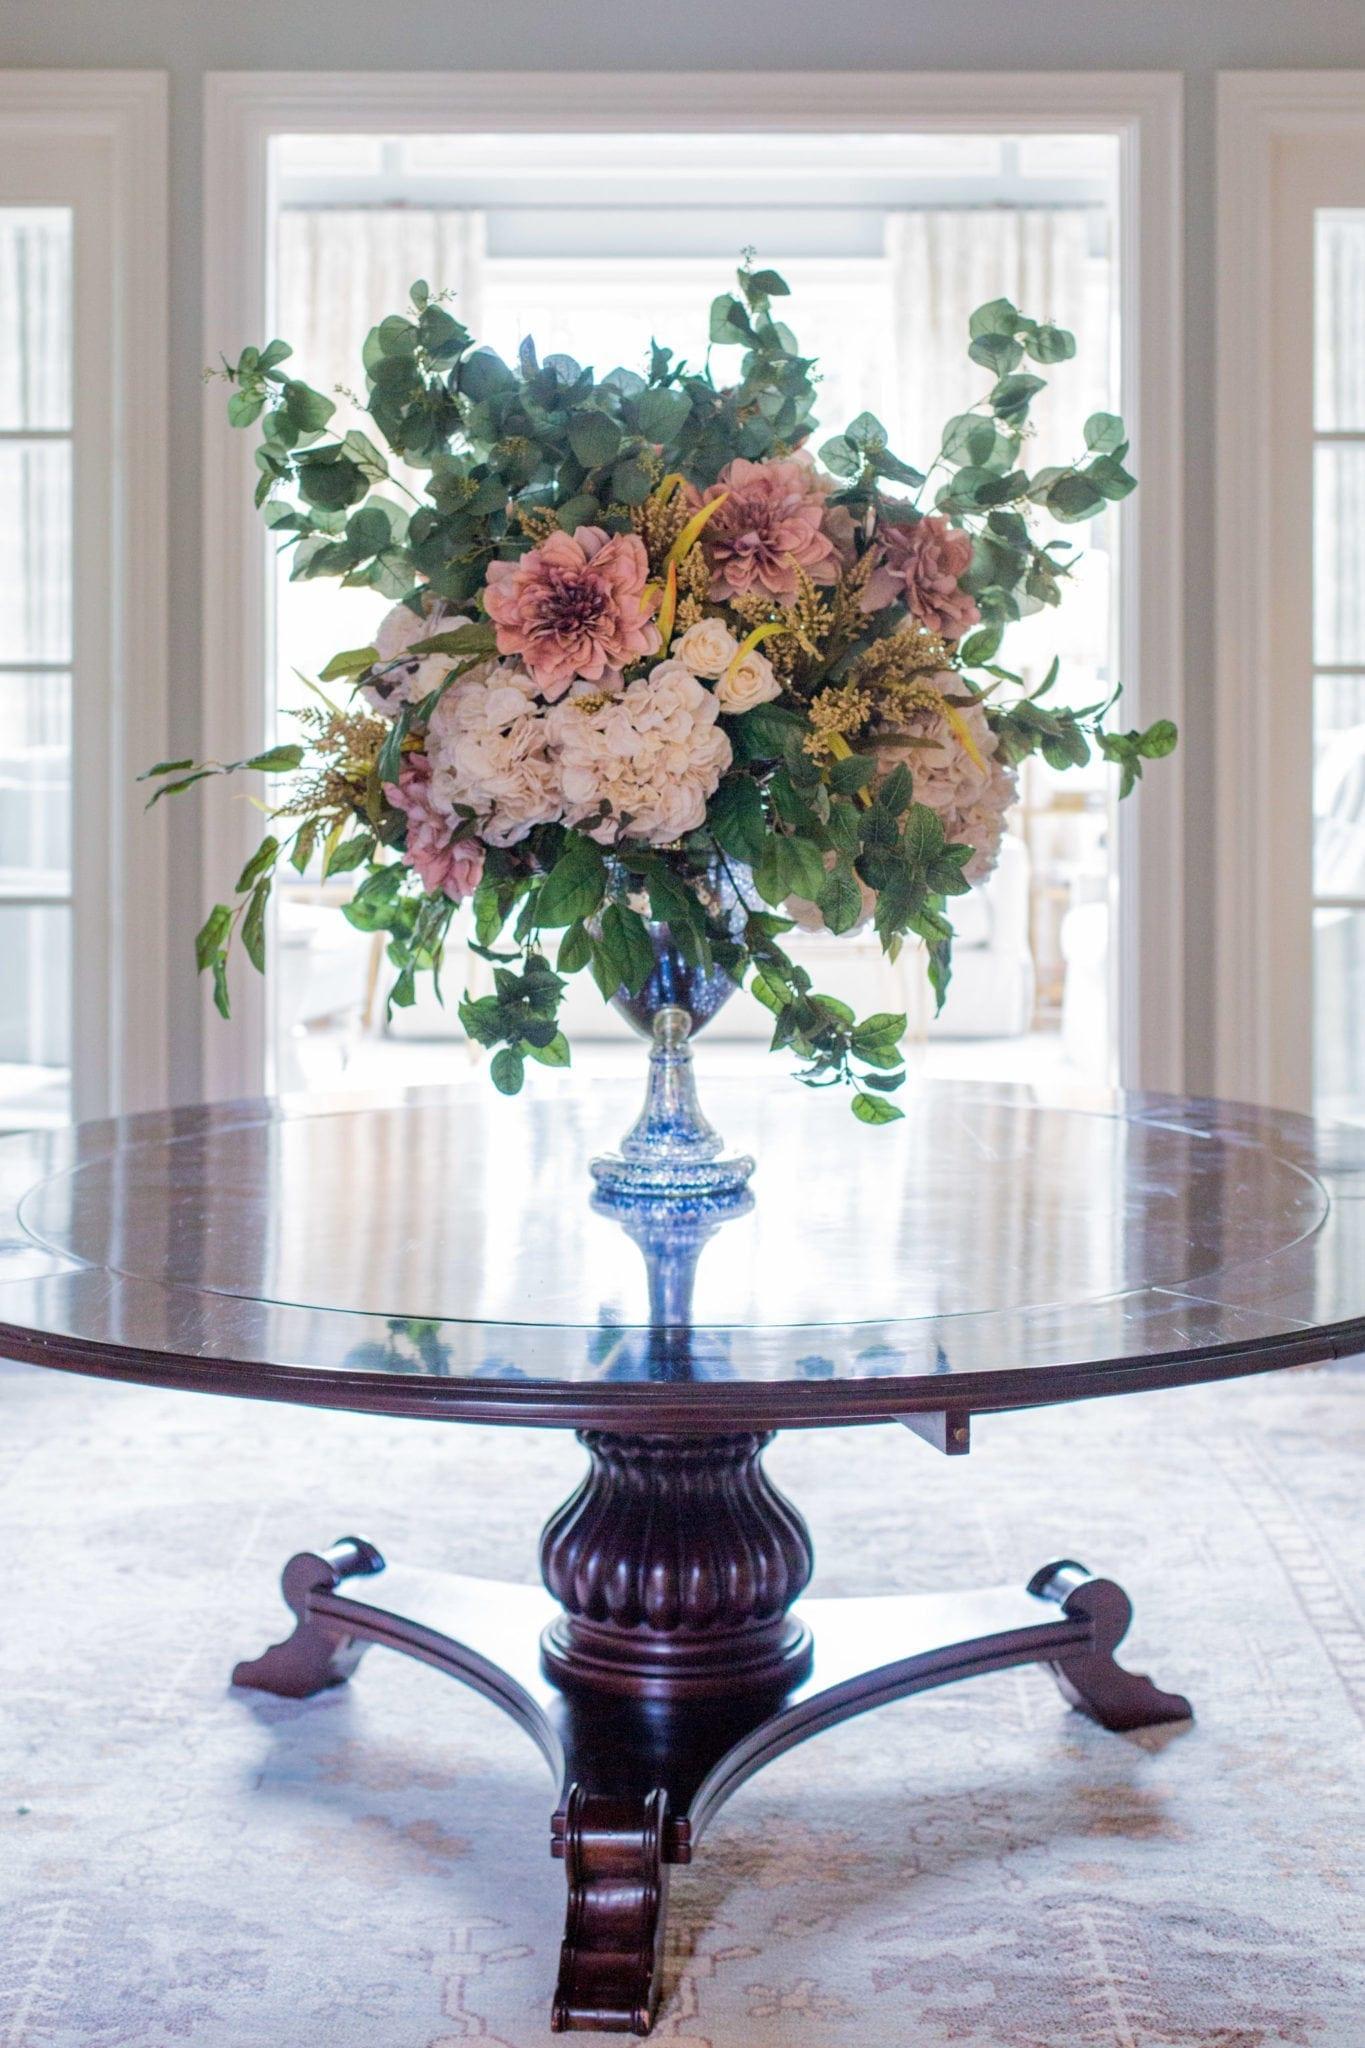 How to make silk flower arrangements in a vase.